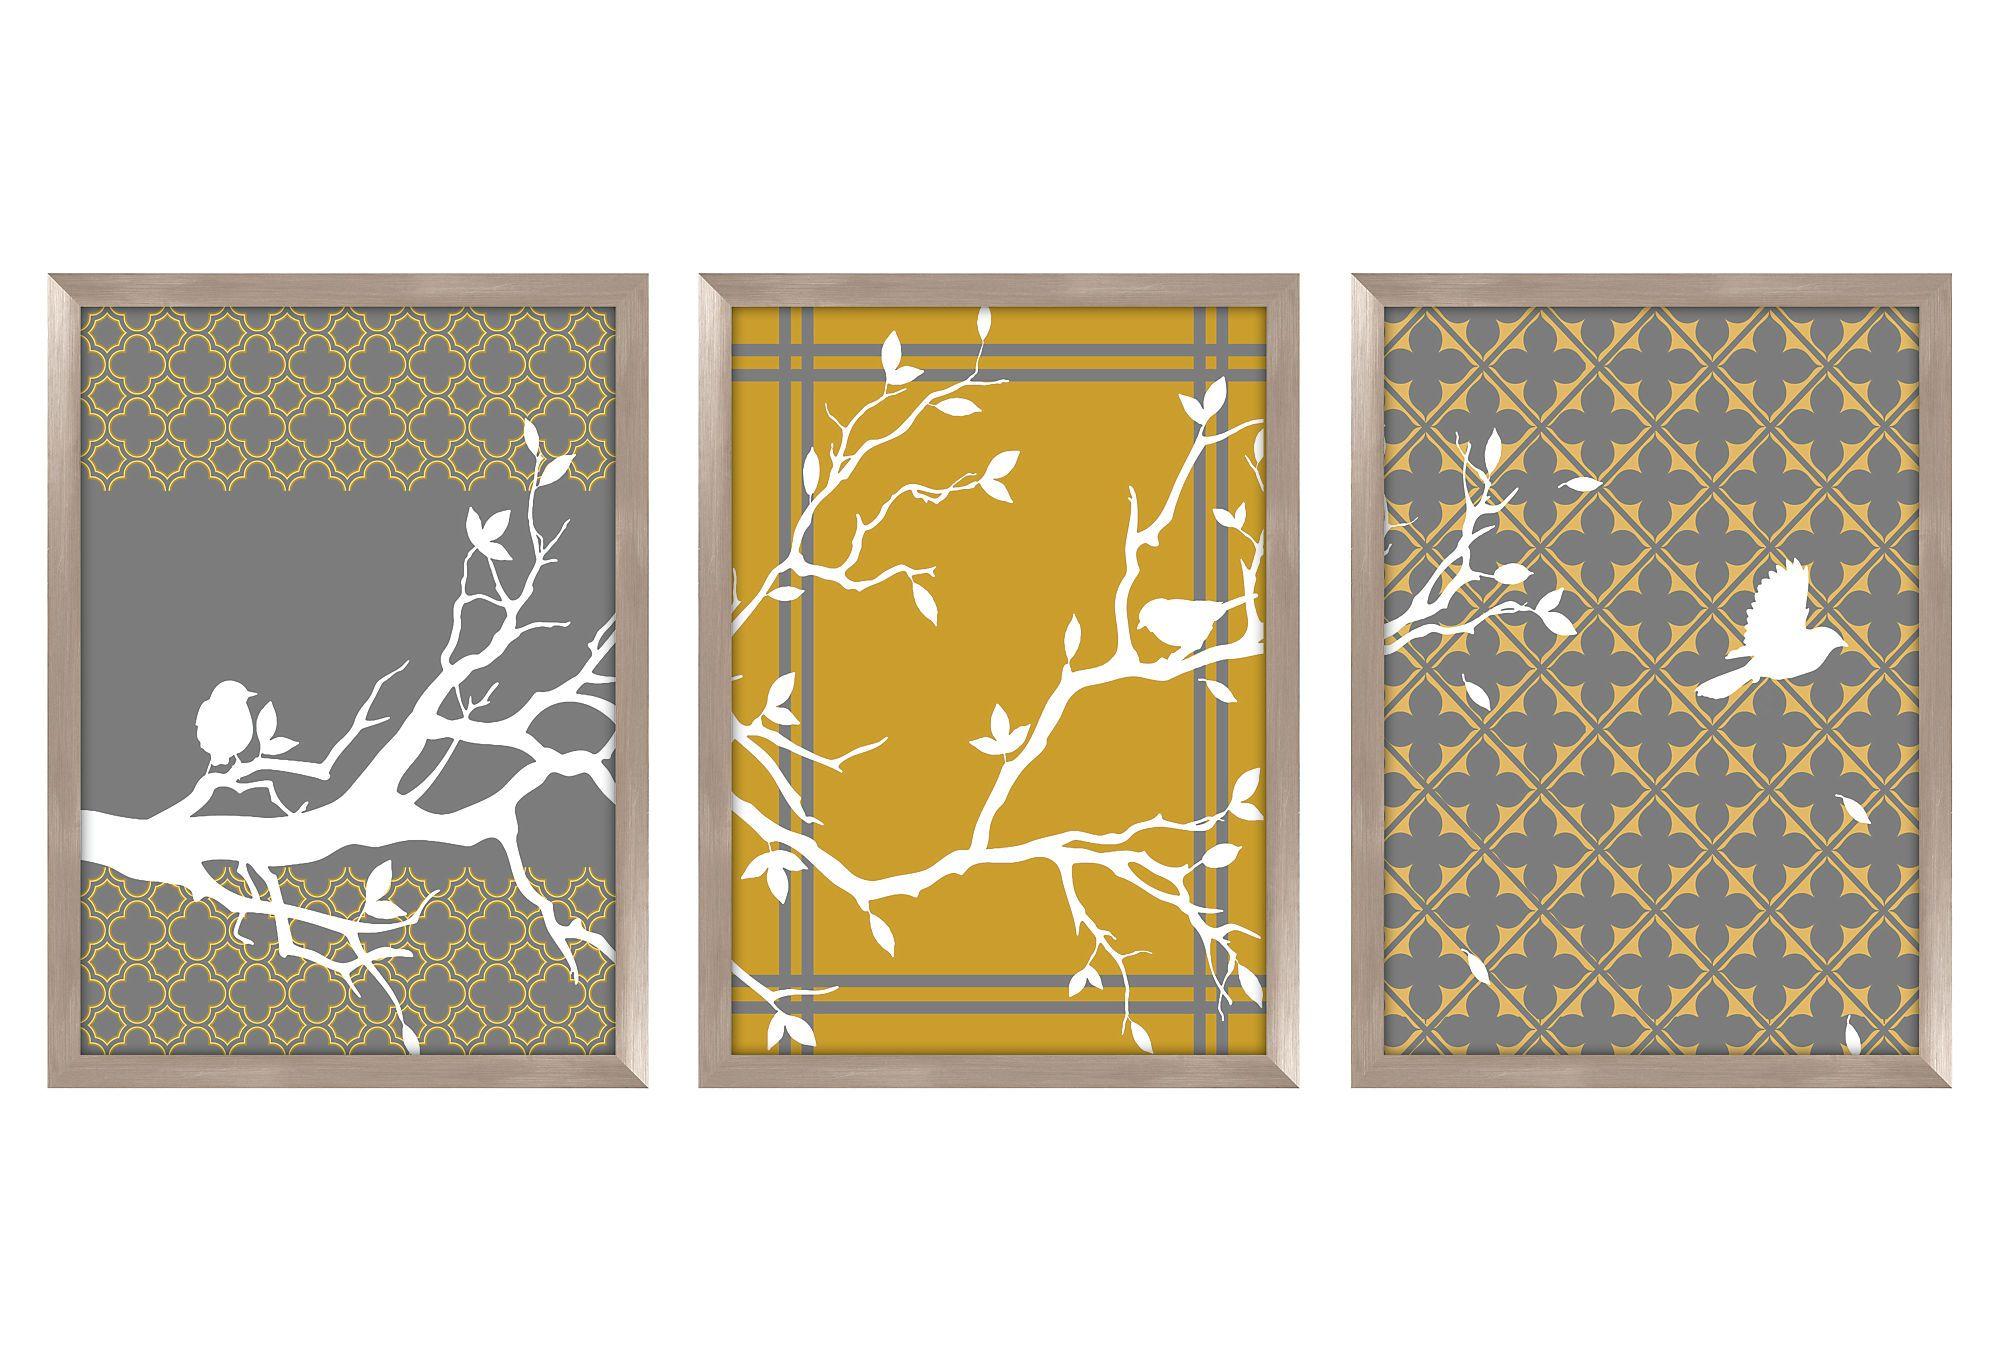 Beautiful tri-set for wall | Decor ideas | Pinterest | Walls